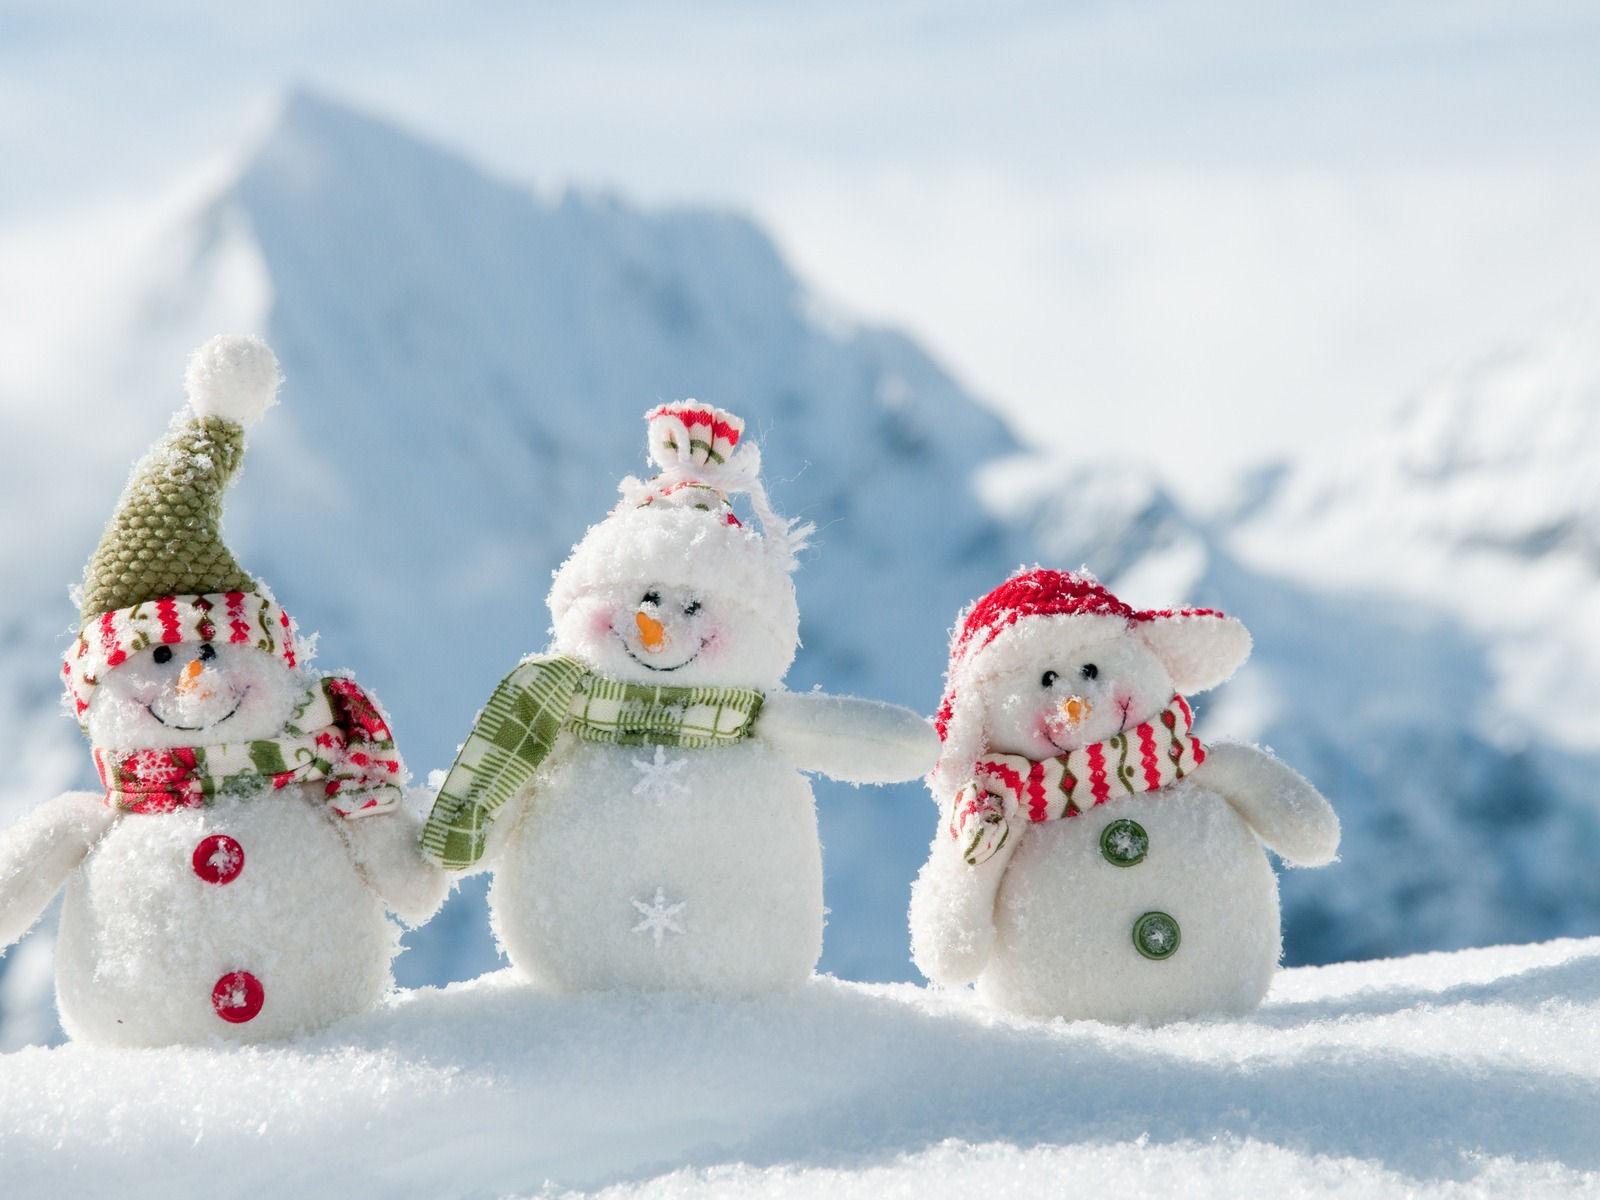 best colorful snowman image